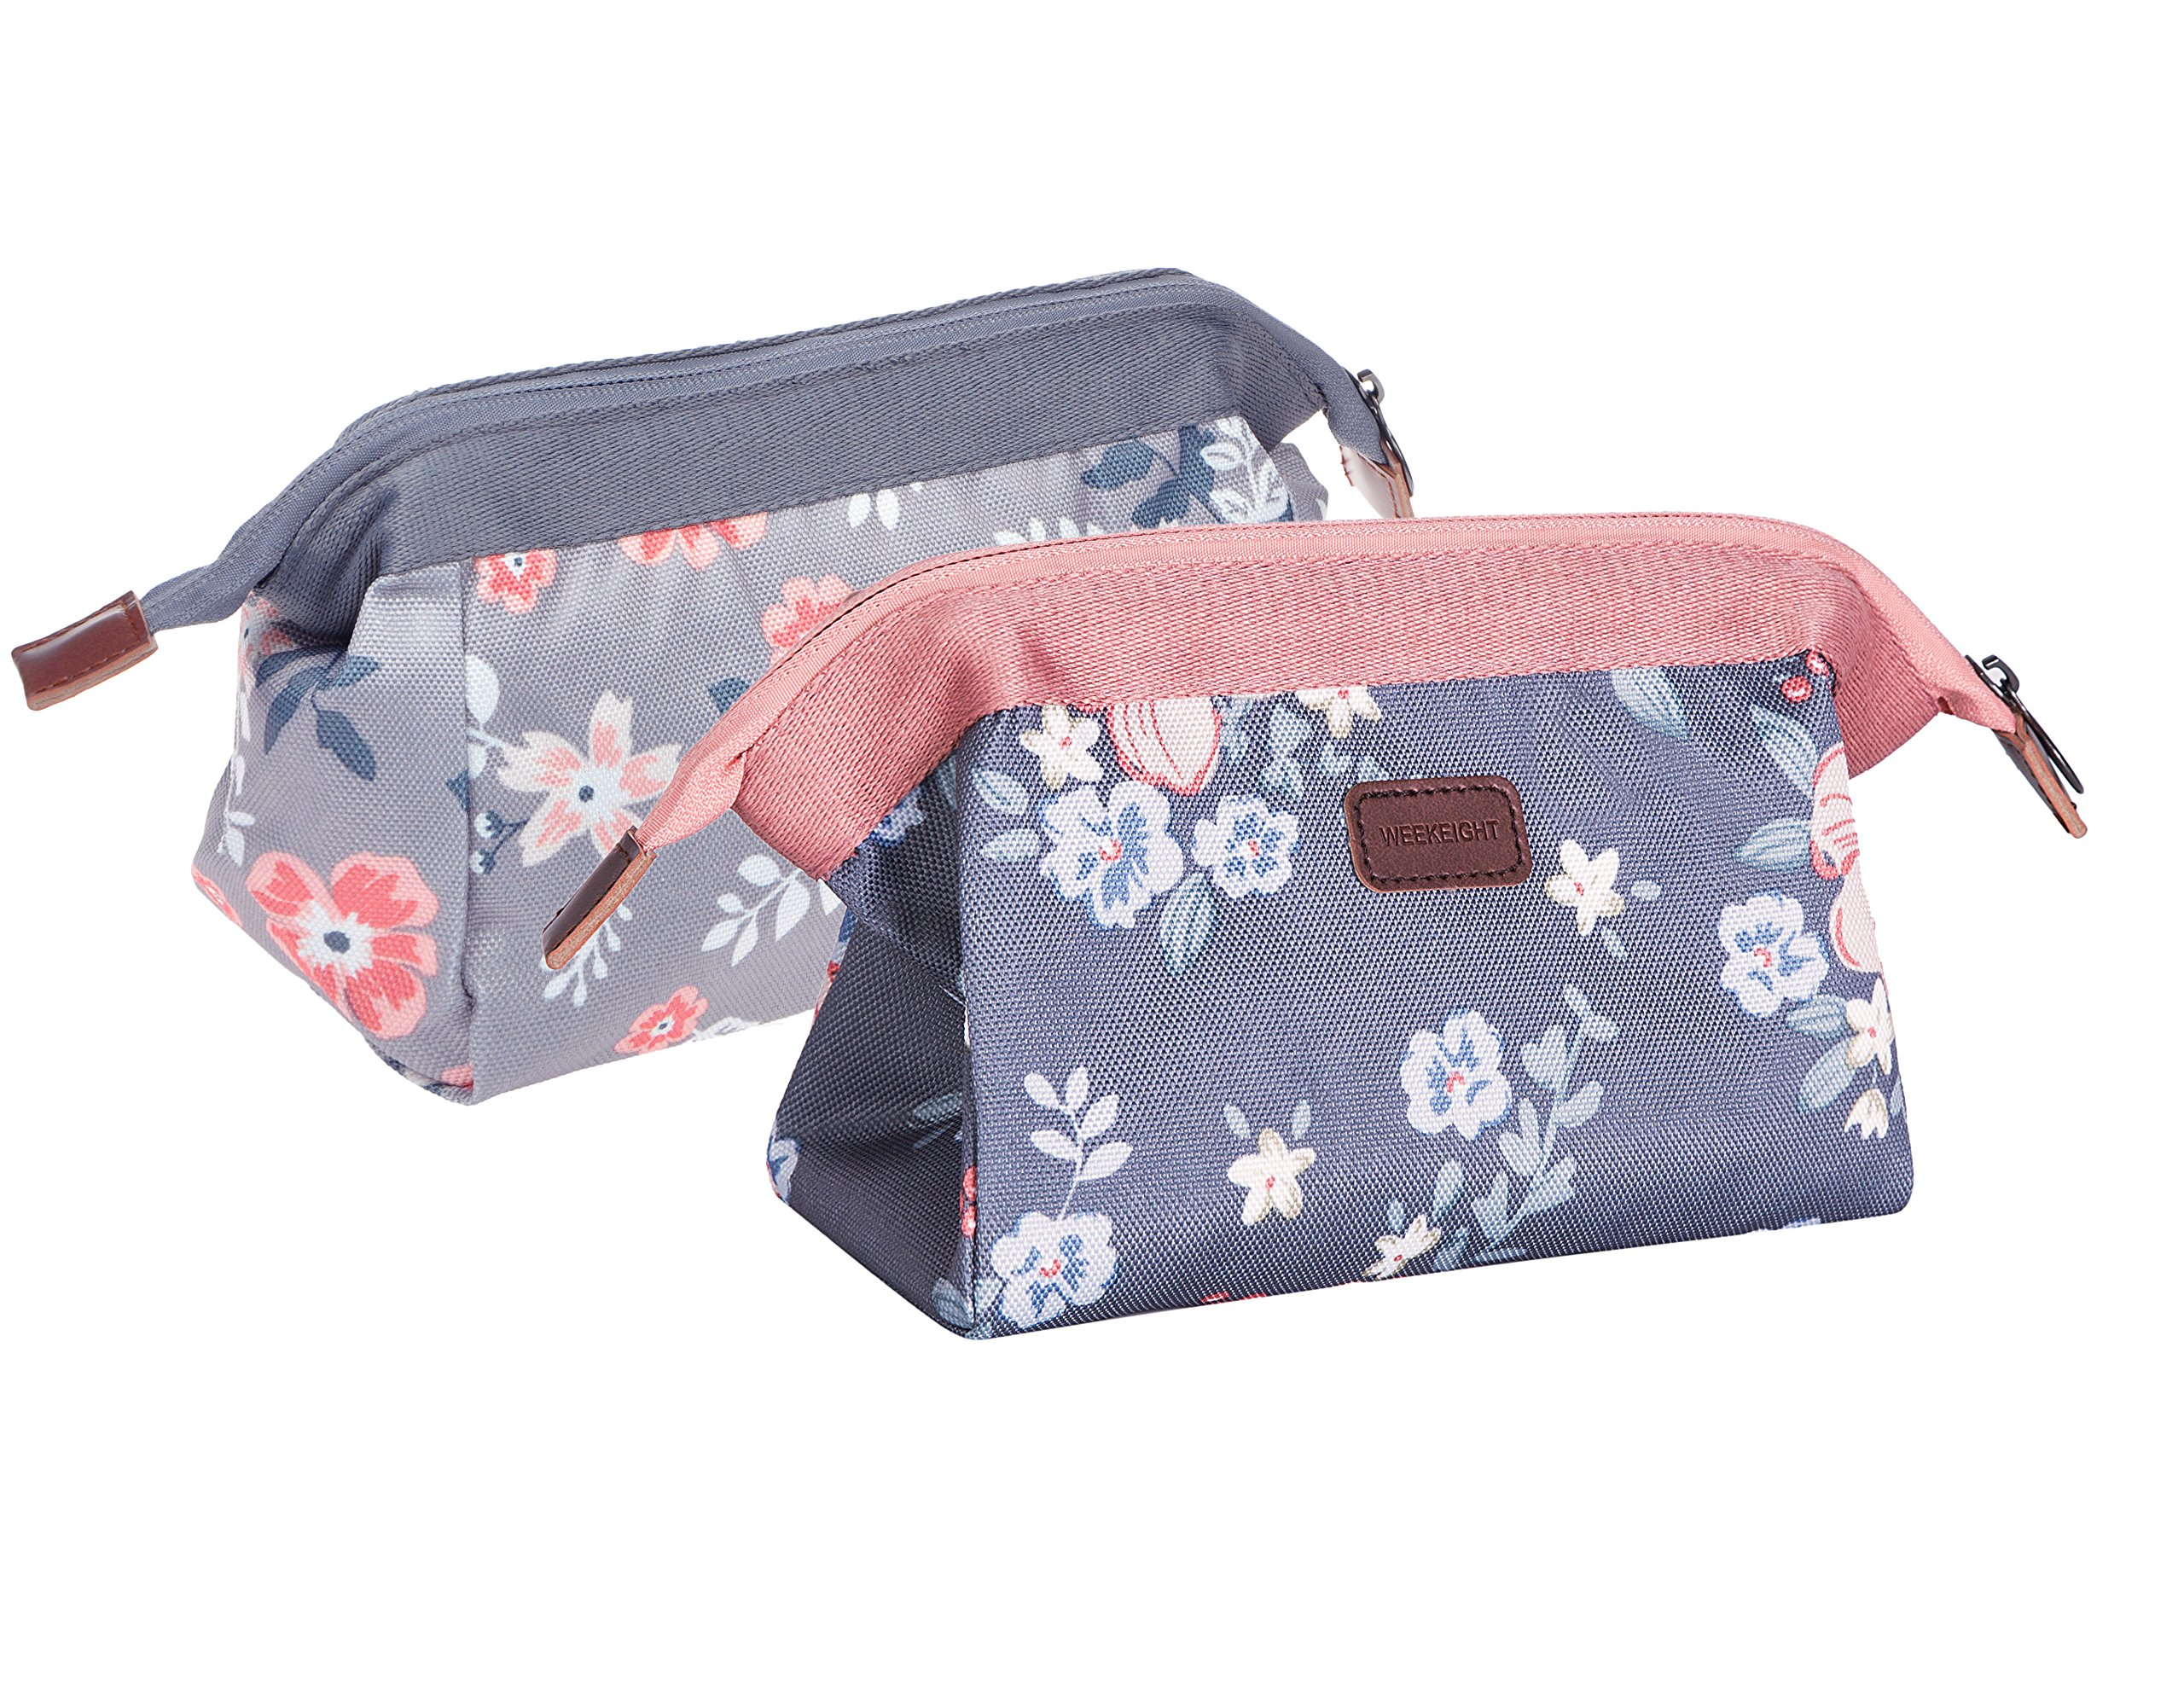 BAGOOE Handy Travel Cosmetic Makeup Clutch Bag Case Pouch Nylon Zipper Carry On Bag Various Colors For Women Men Girls,Set2#Flower